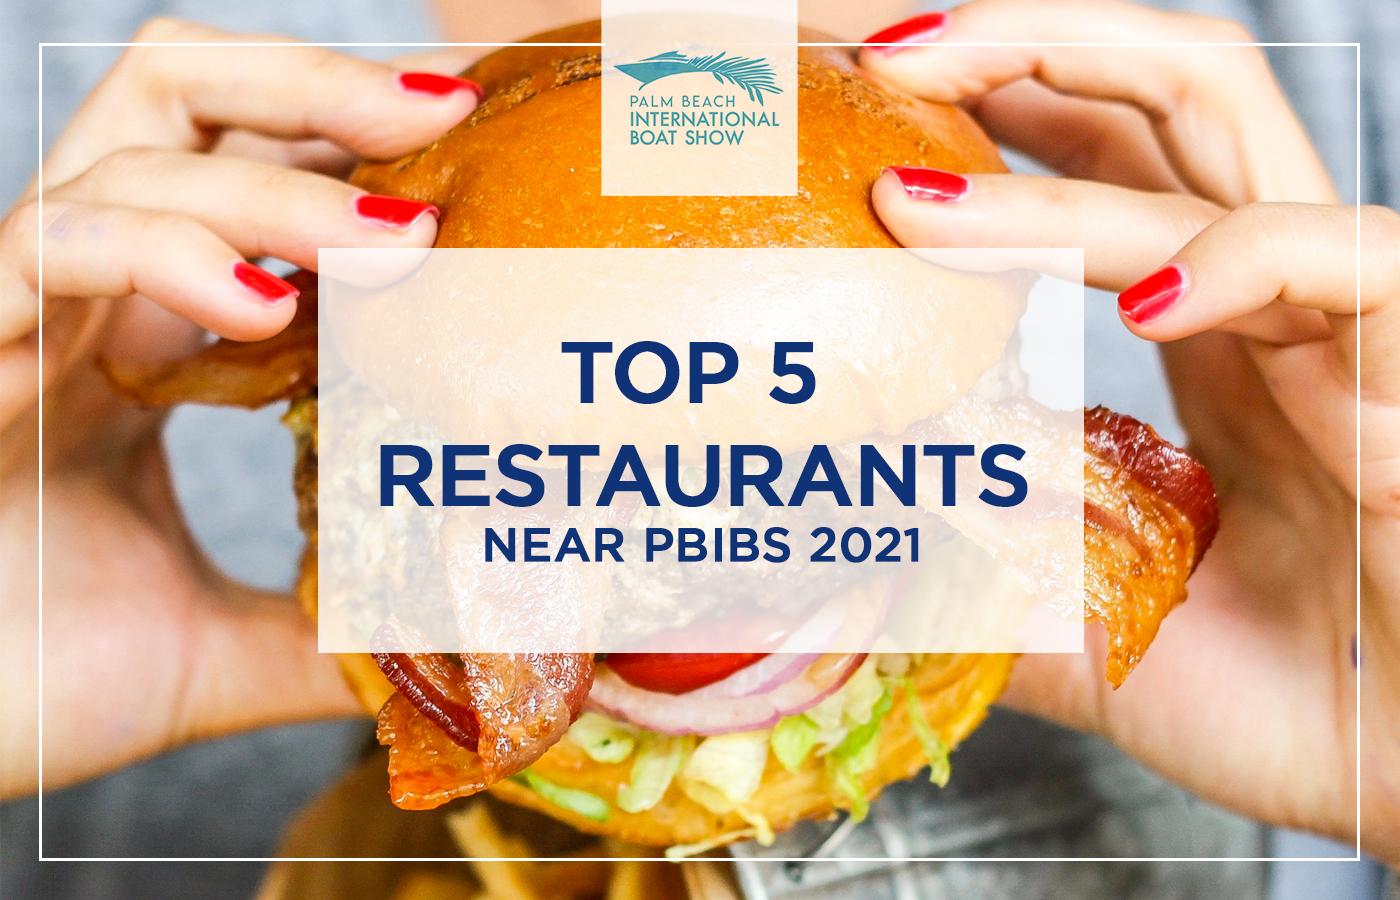 Best Restaurants Near The 2021 Palm Beach Boat Show